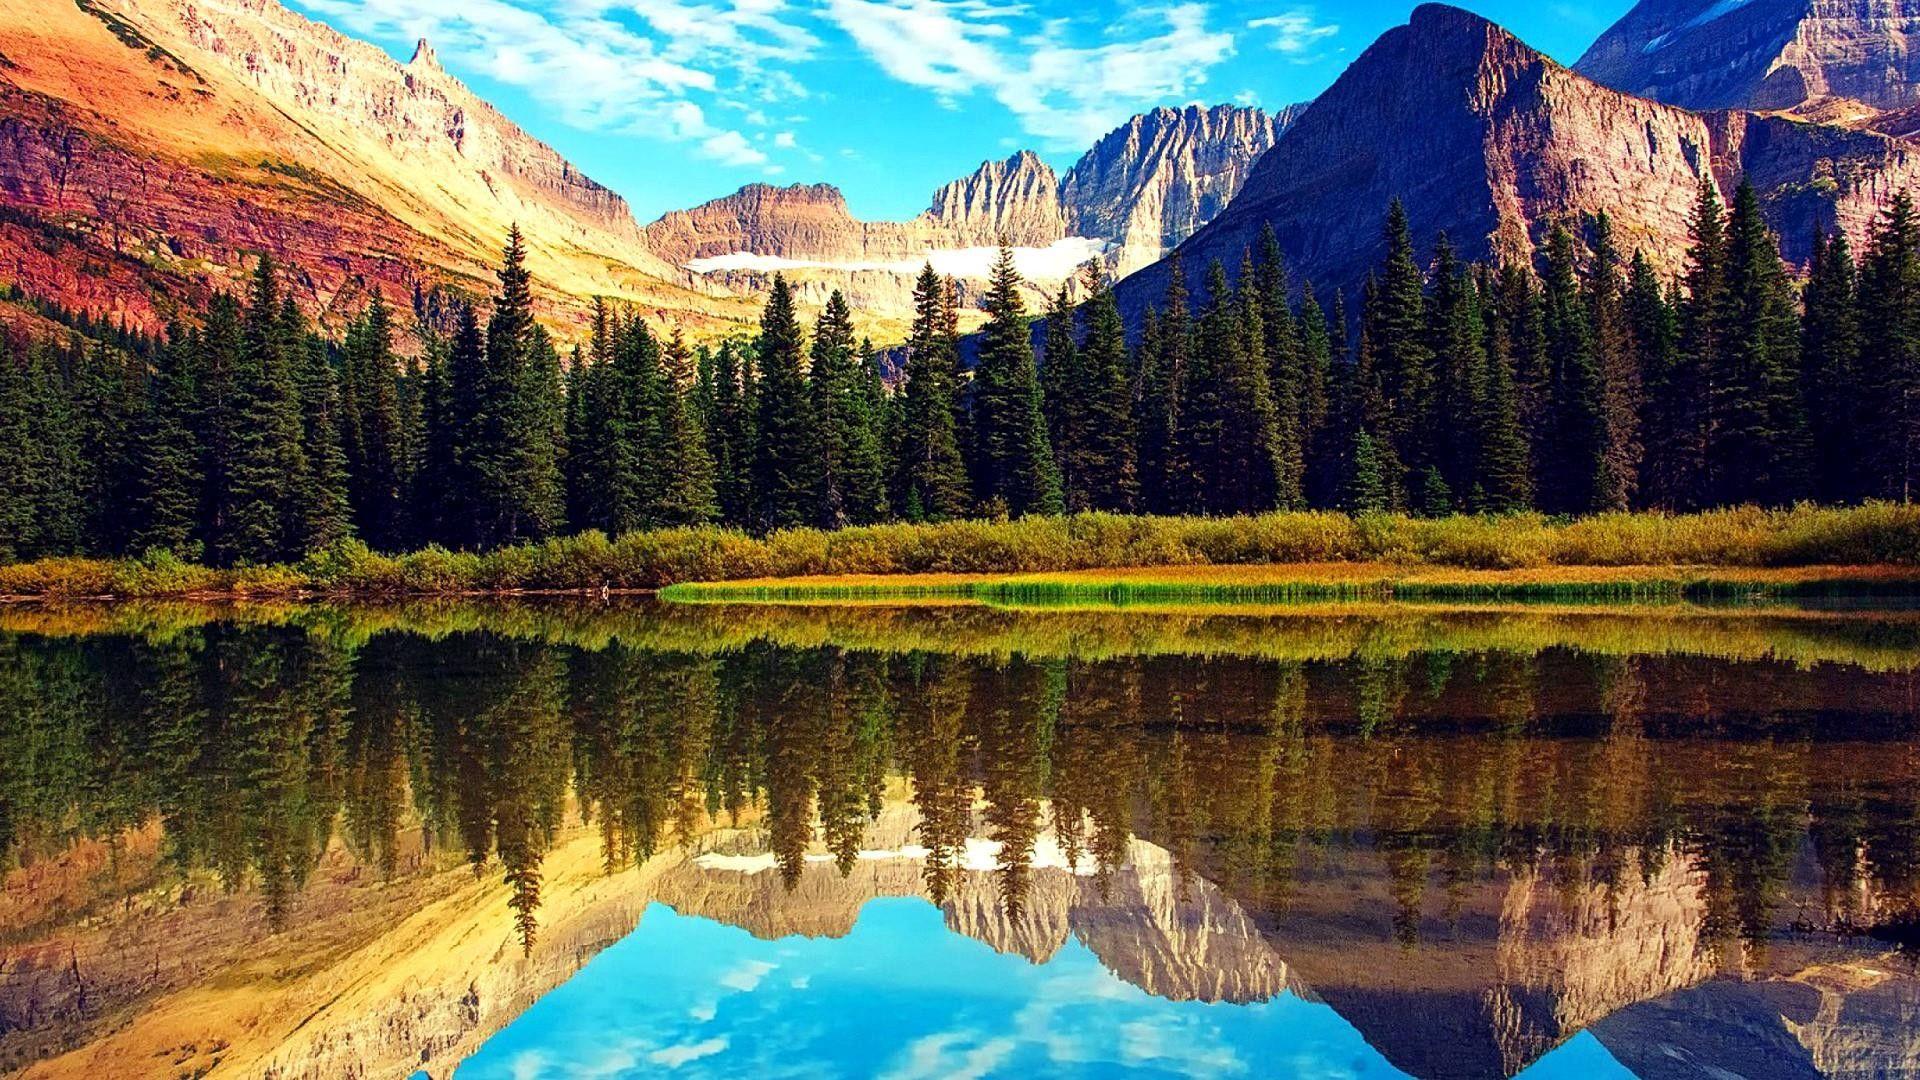 Montana Wallpapers   Top Montana Backgrounds   WallpaperAccess 1920x1080